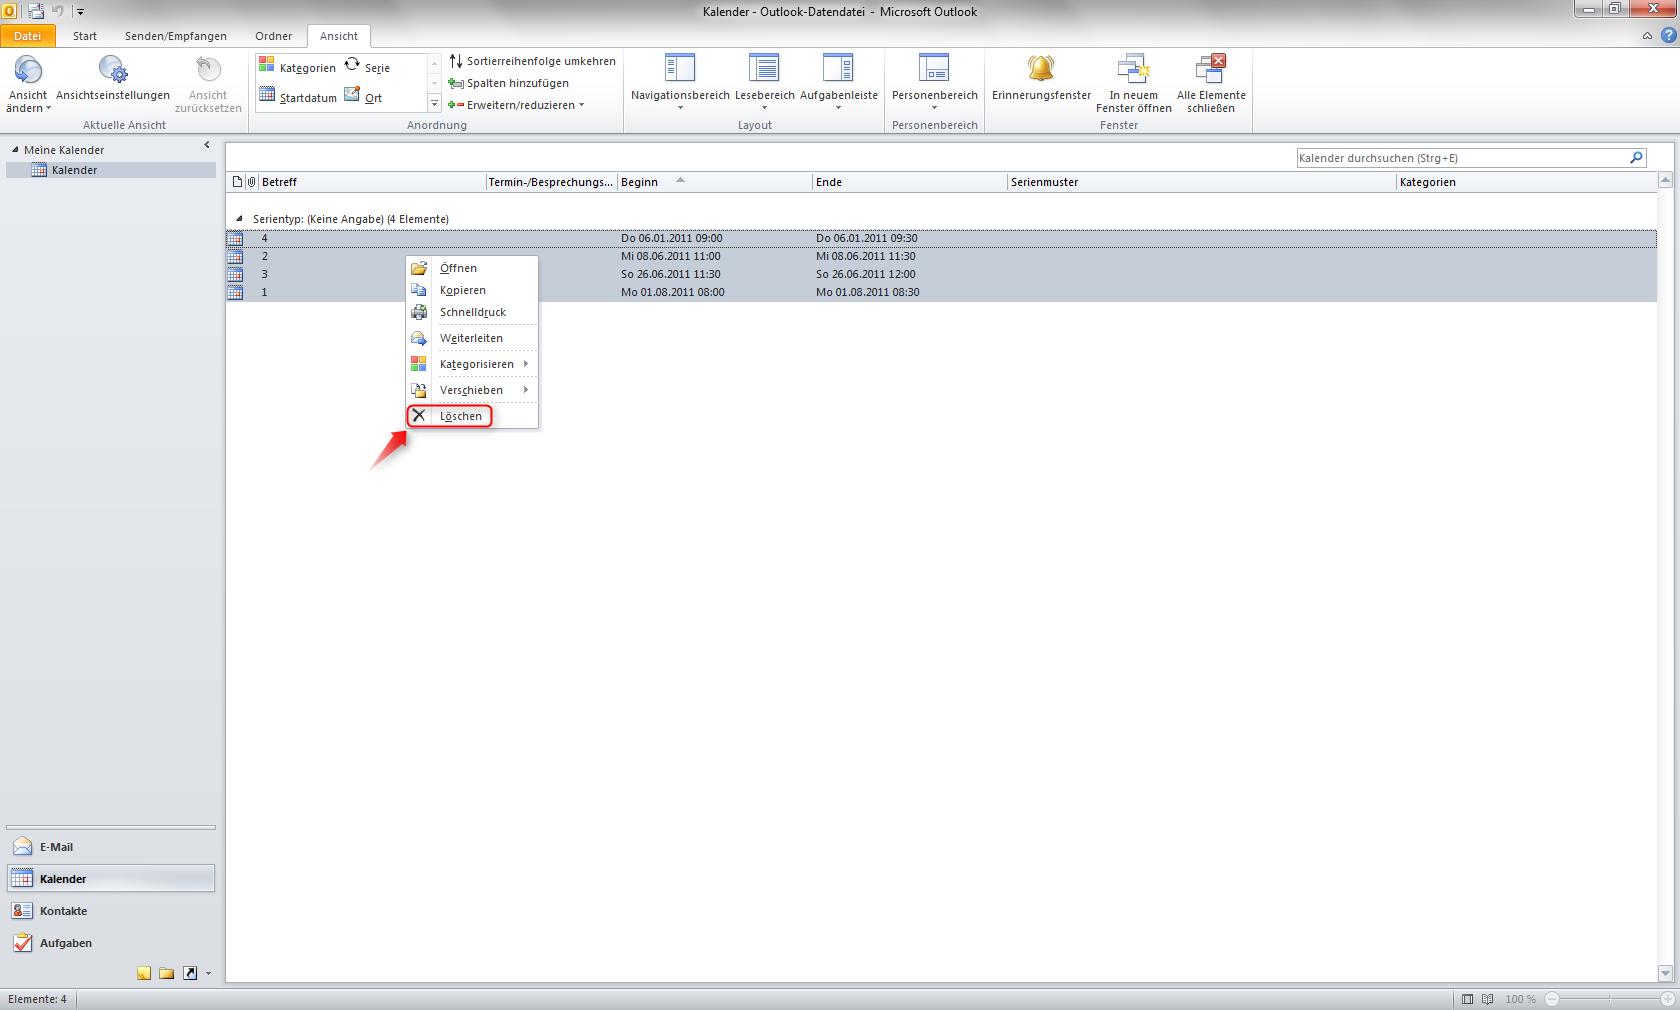 06-Outlook-2010-Kalendereintraege-entfernen-Liste-loeschen-470.png?nocache=1312379575124